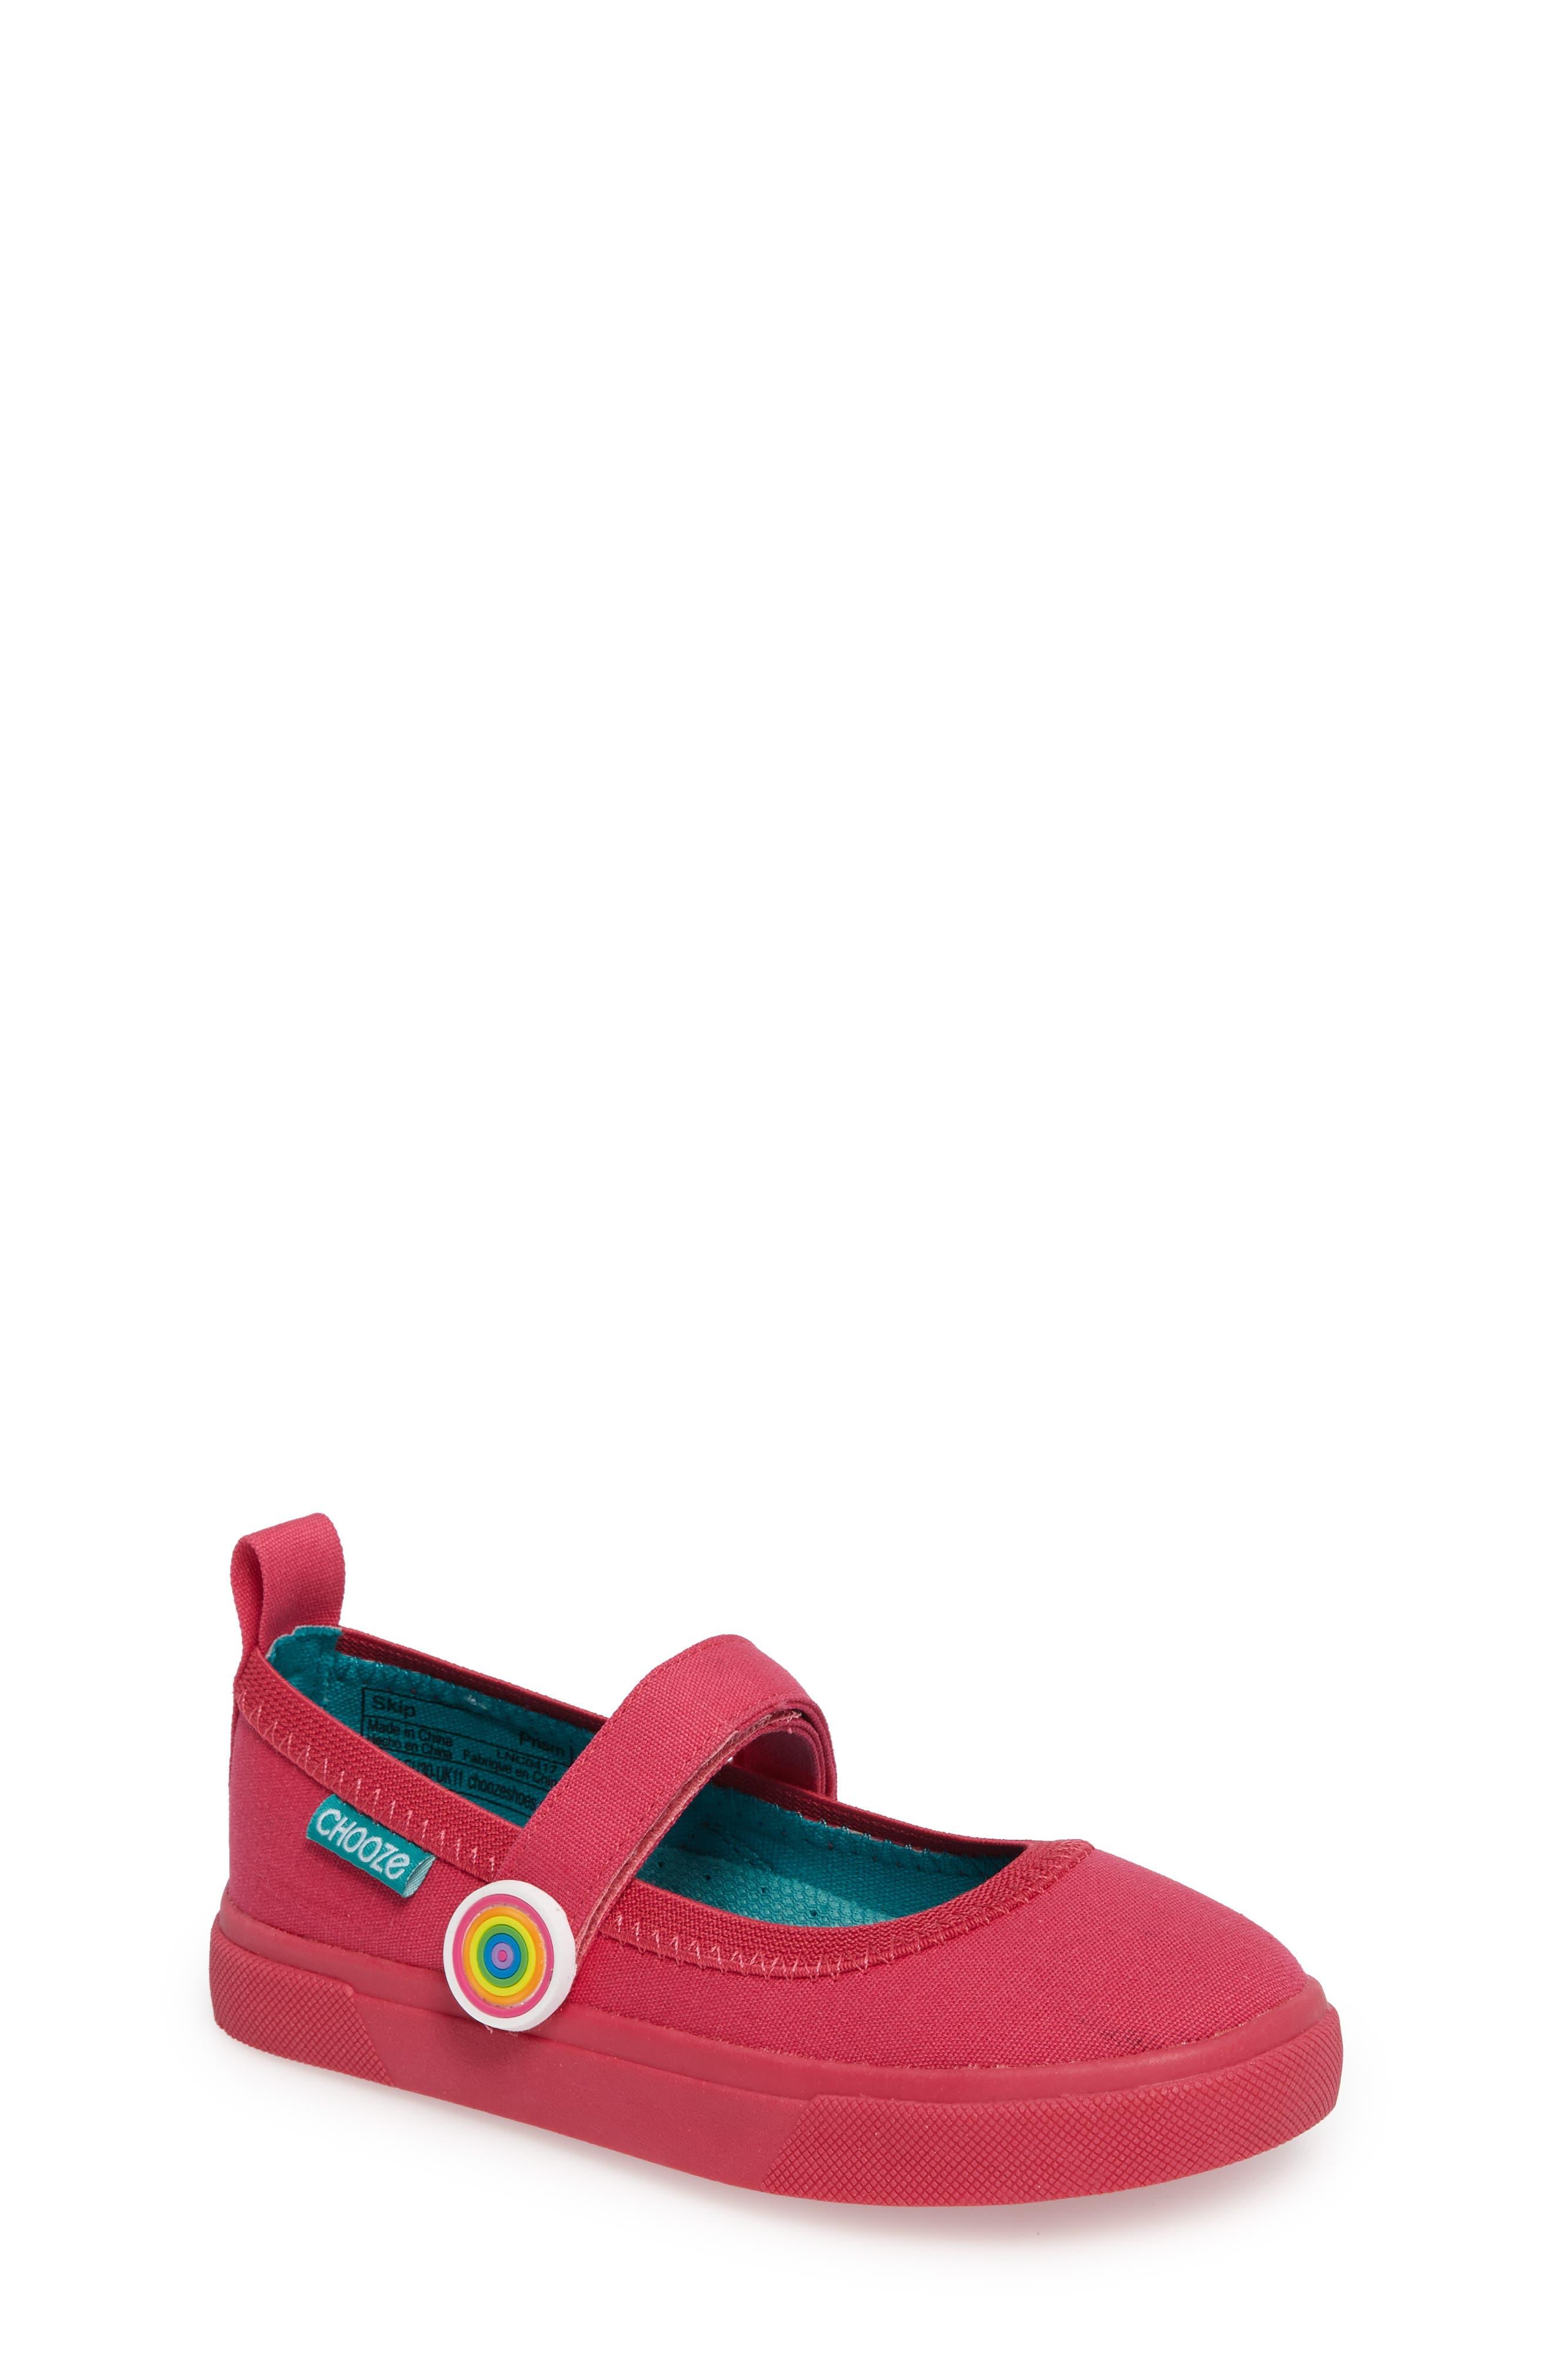 Skip Mary Jane Sneaker,                         Main,                         color, Prism